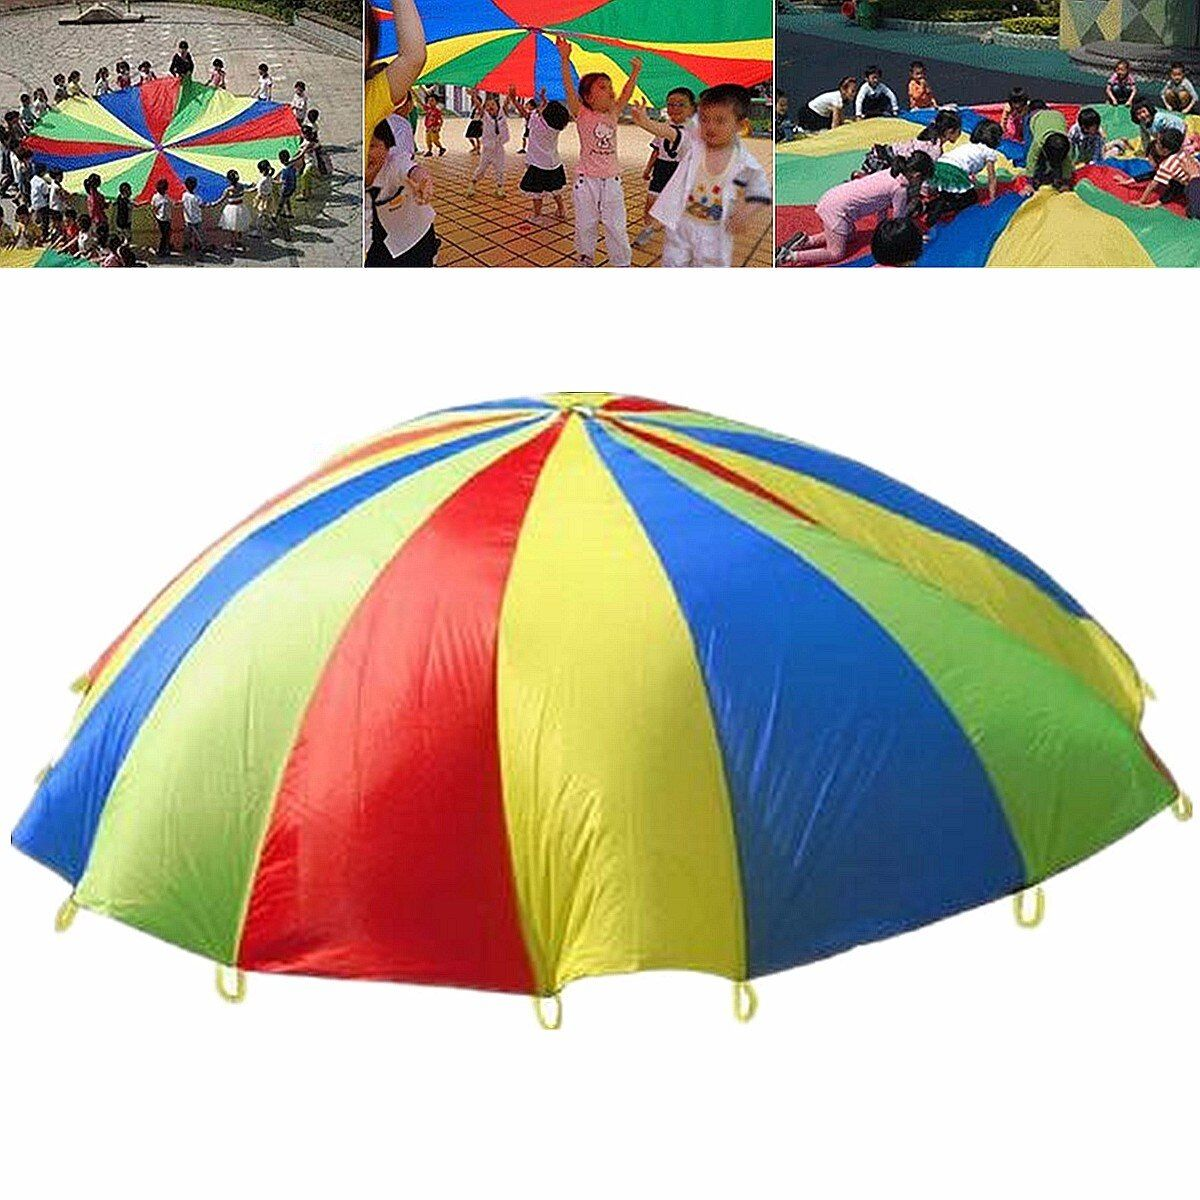 4M Rainbow Umbrella Parachute Toy Child Kids Games Sports Outdoor Development Toy Jump-sack Ballute Educational Play Parachute